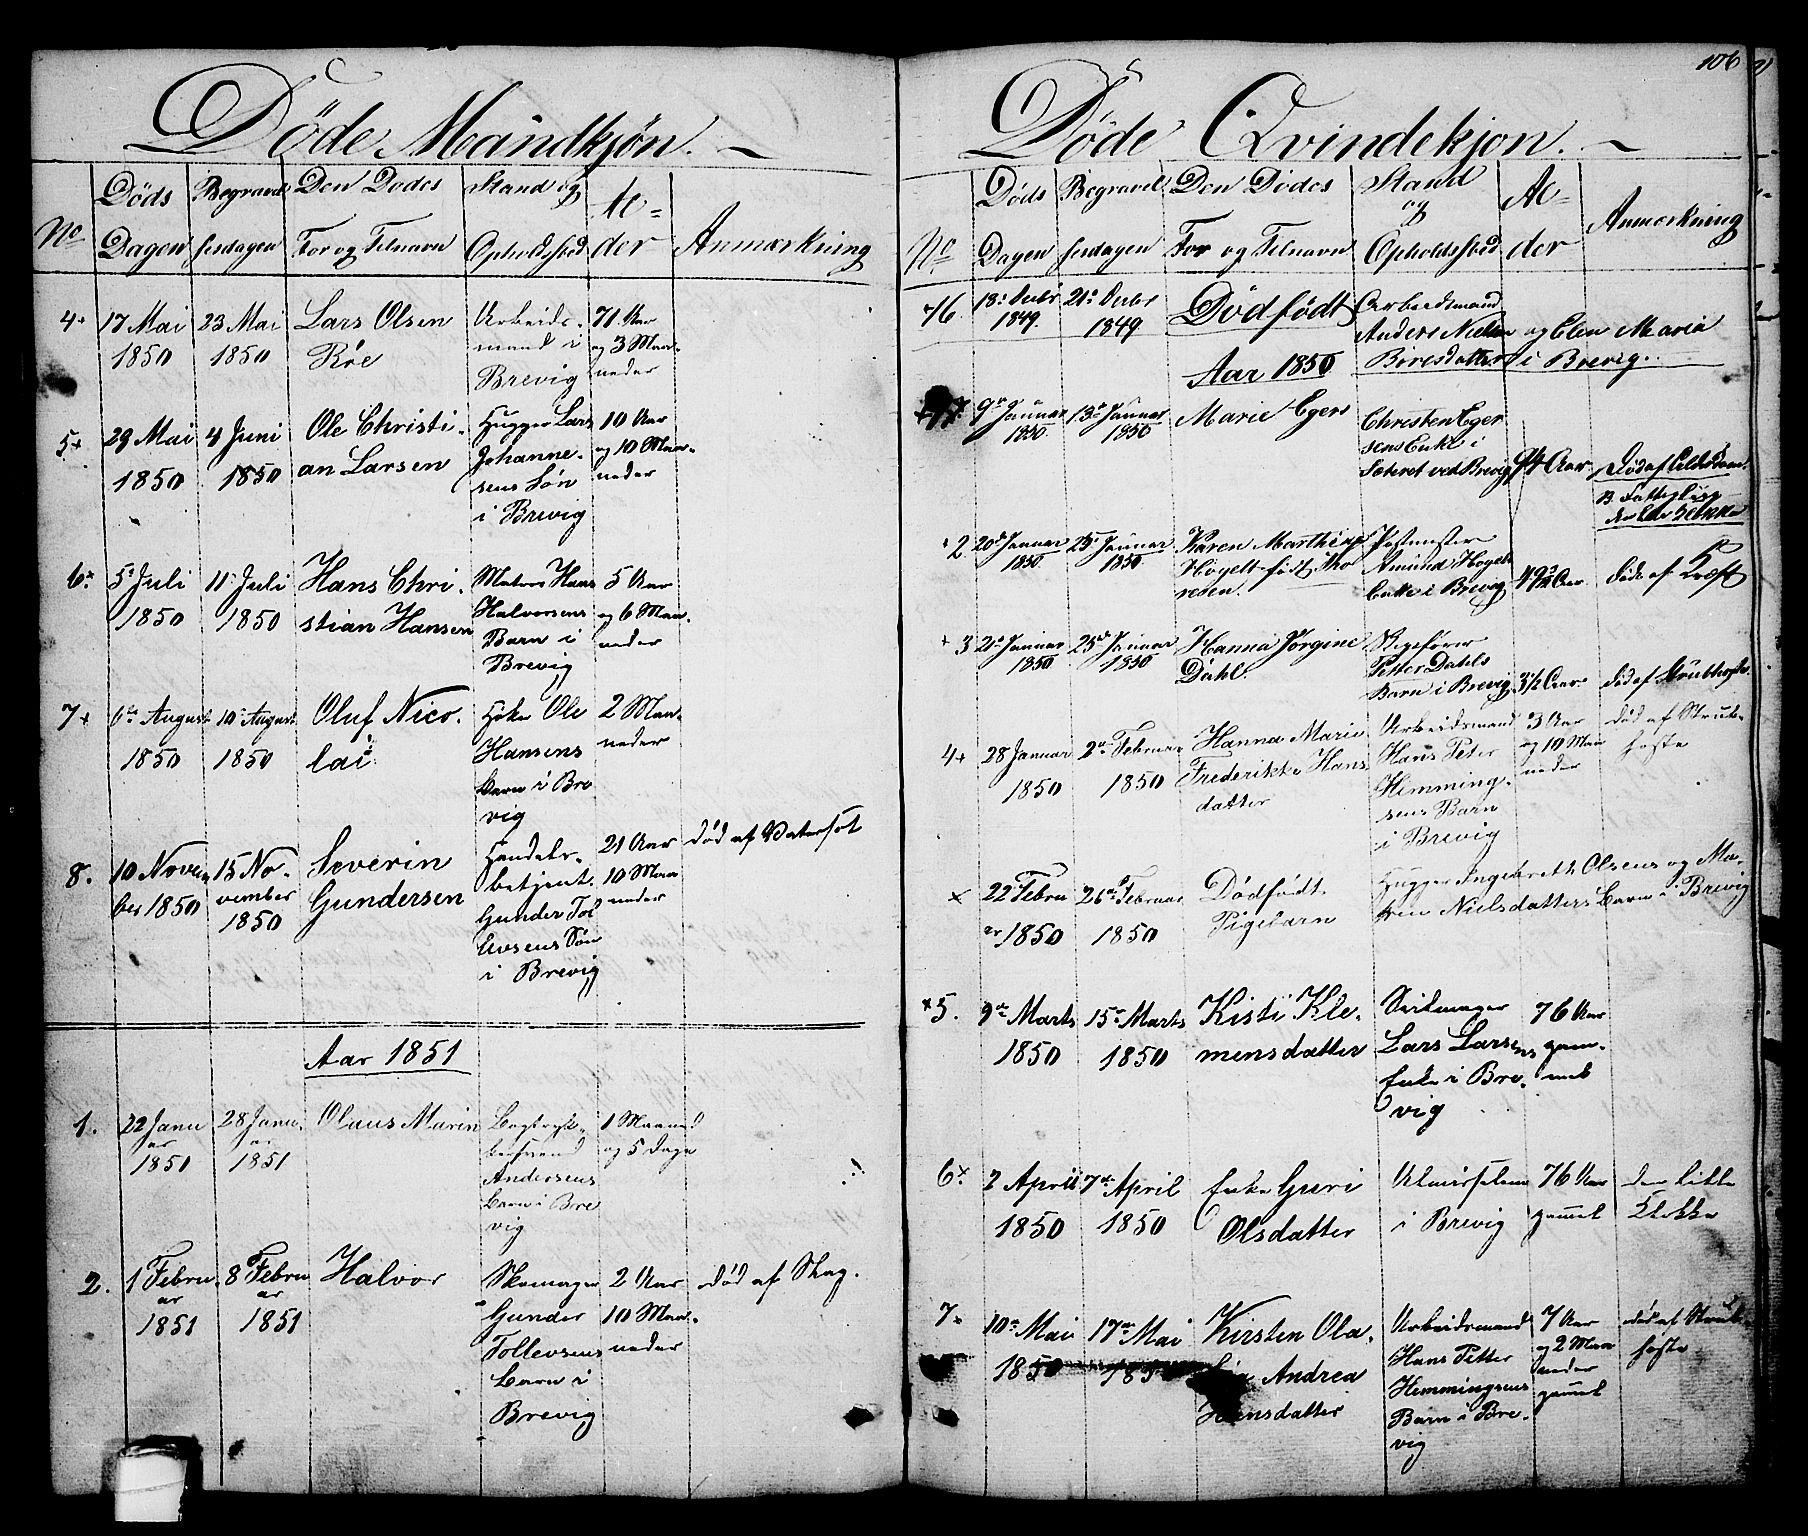 SAKO, Brevik kirkebøker, G/Ga/L0002: Klokkerbok nr. 2, 1846-1865, s. 106